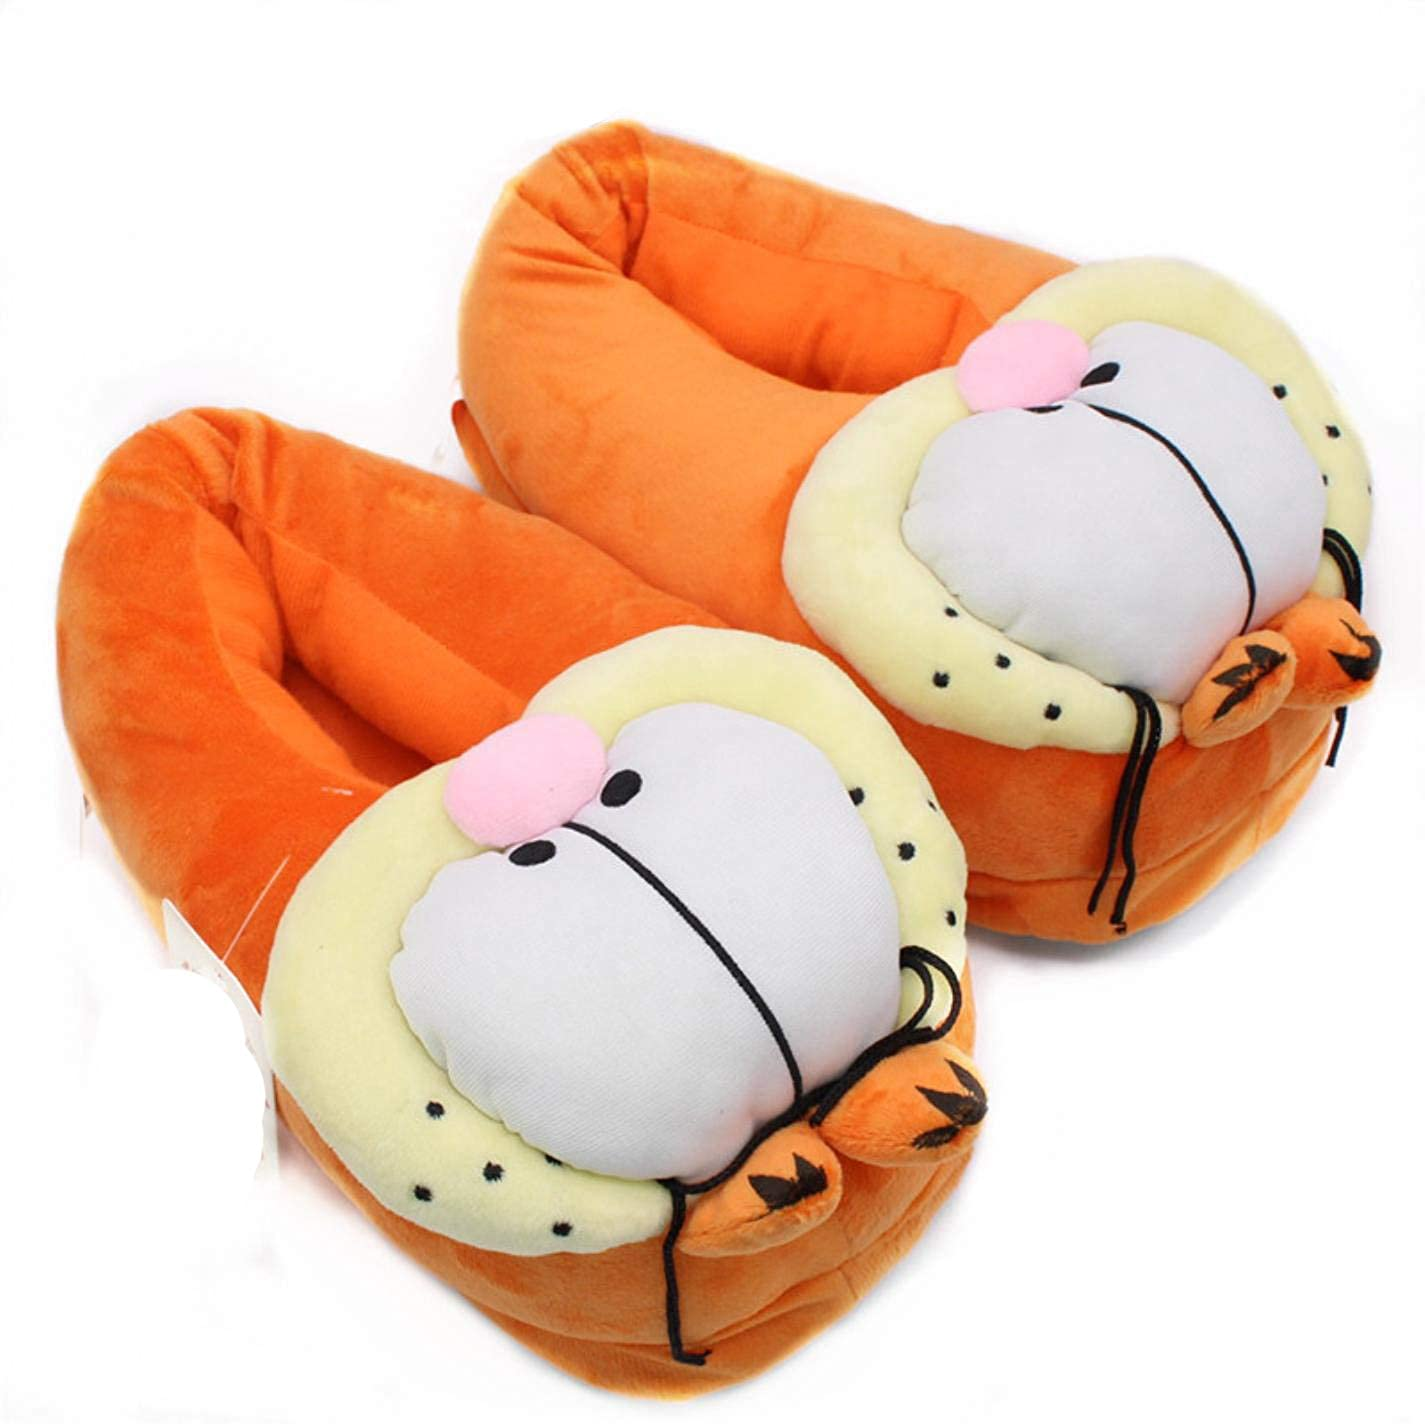 Women's unisex Garfield style cartoon warm plush slippers cotton shoes